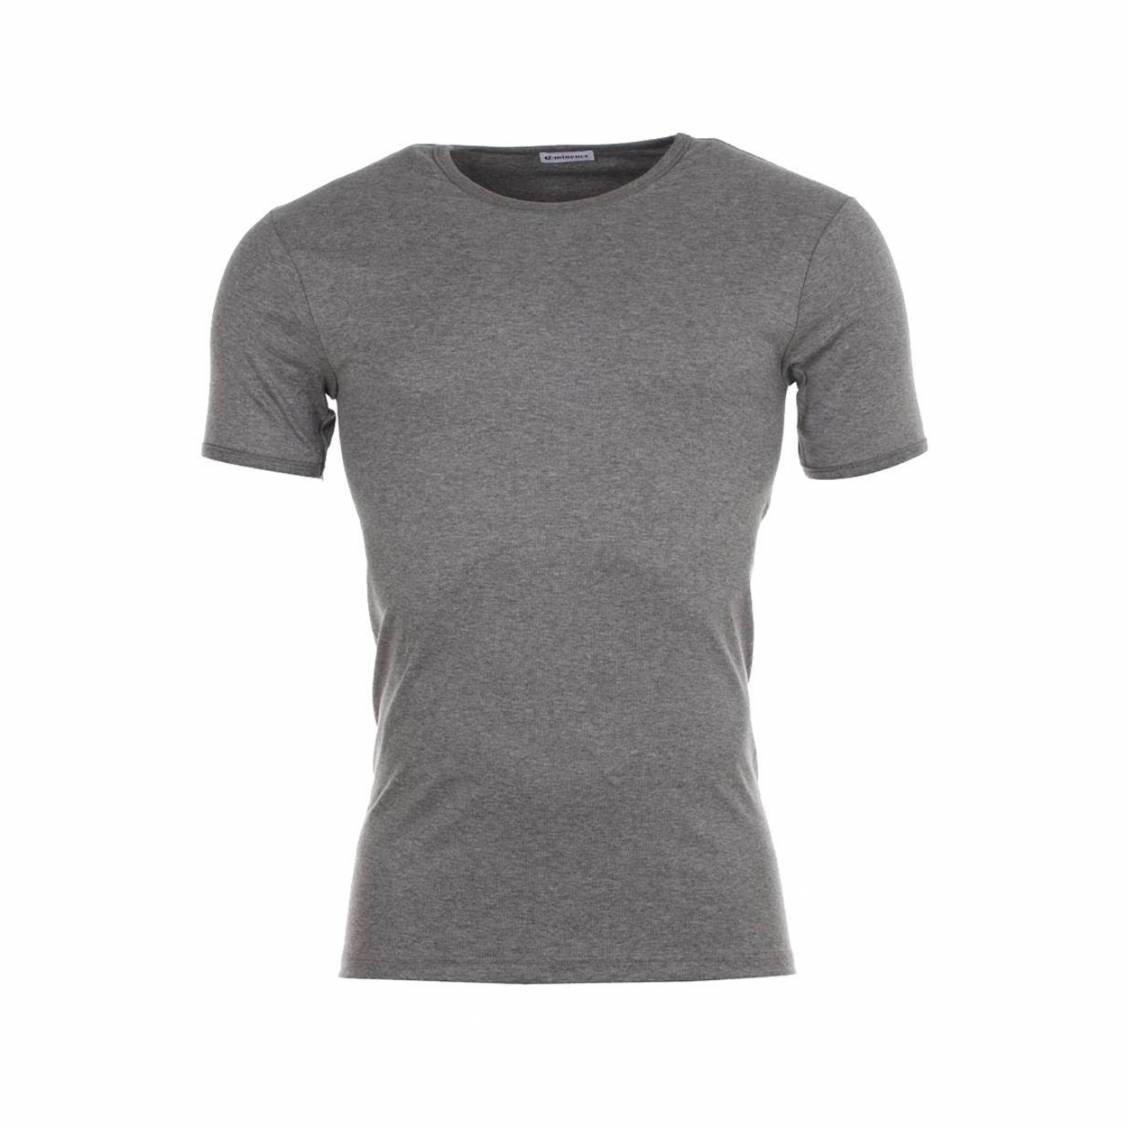 https://www.ruedeshommes.com/tee-shirt-gris-col-rond-en-pur-coton-hypoallergenique-6825-124.php